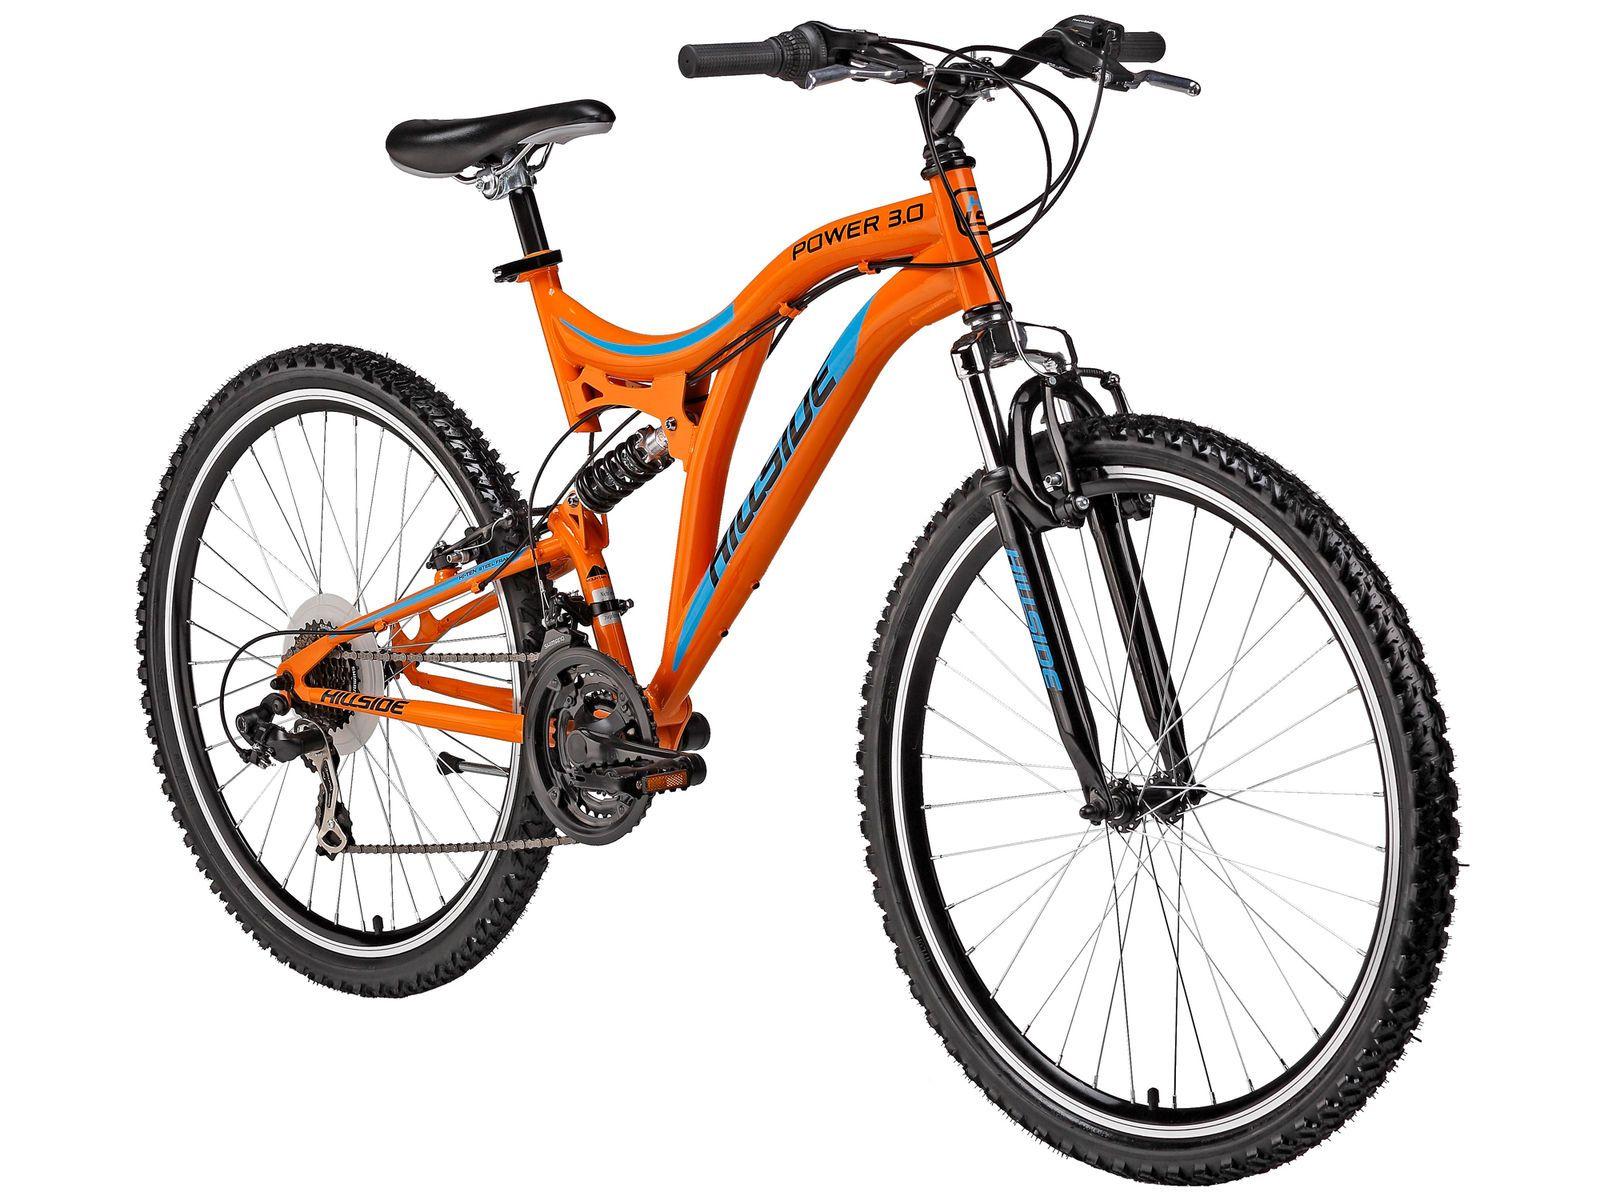 Ebay Angebot 26 Zoll Mountainbike Fahrrad 26 Mountain Bike Rad Mtb